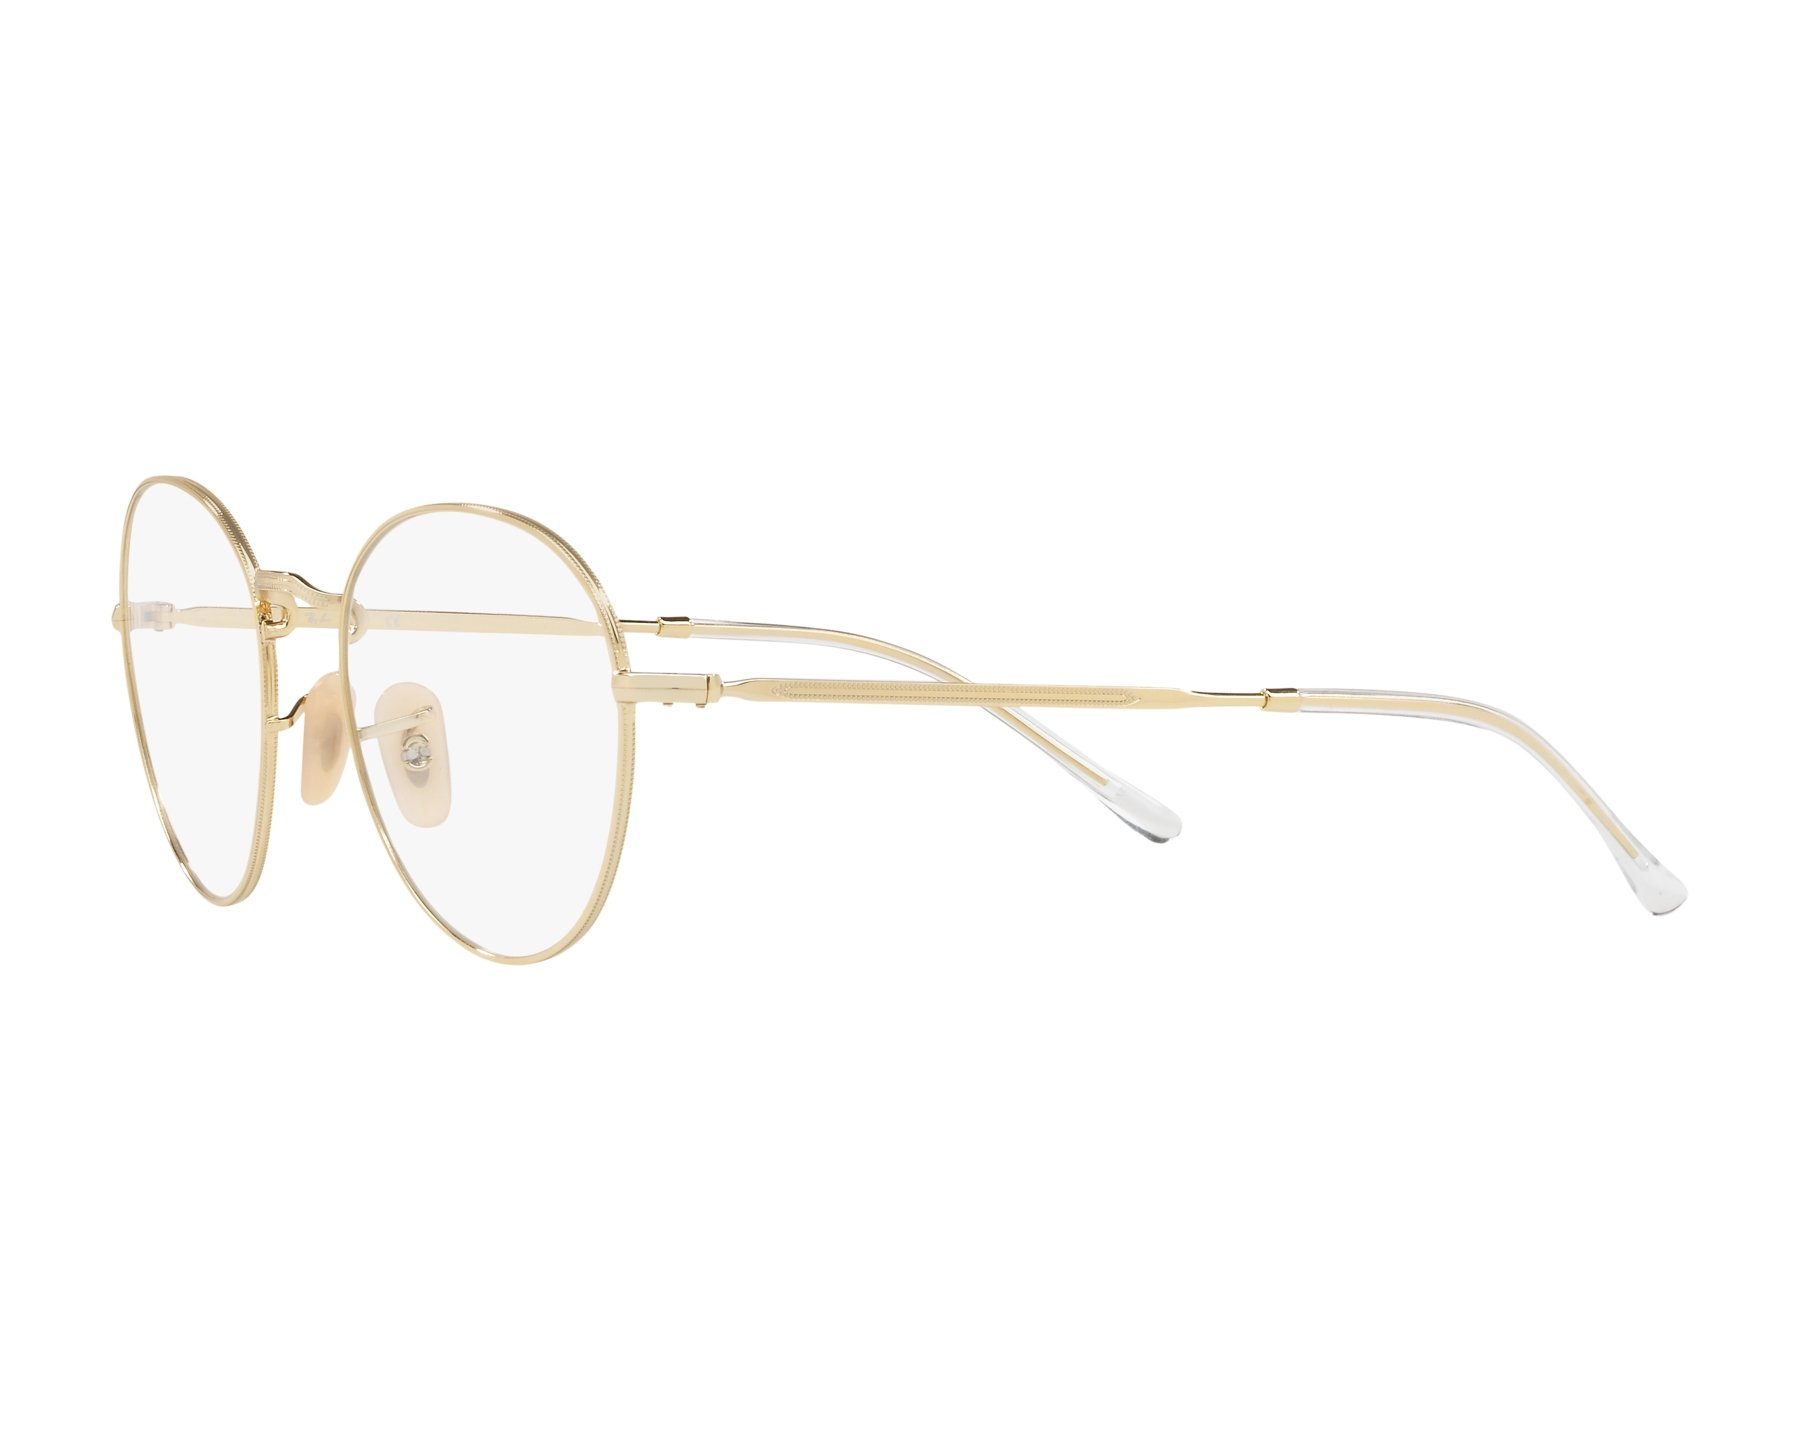 f1a2334a91 eyeglasses Ray-Ban RX-3582-V 2500 49-20 Gold 360 degree